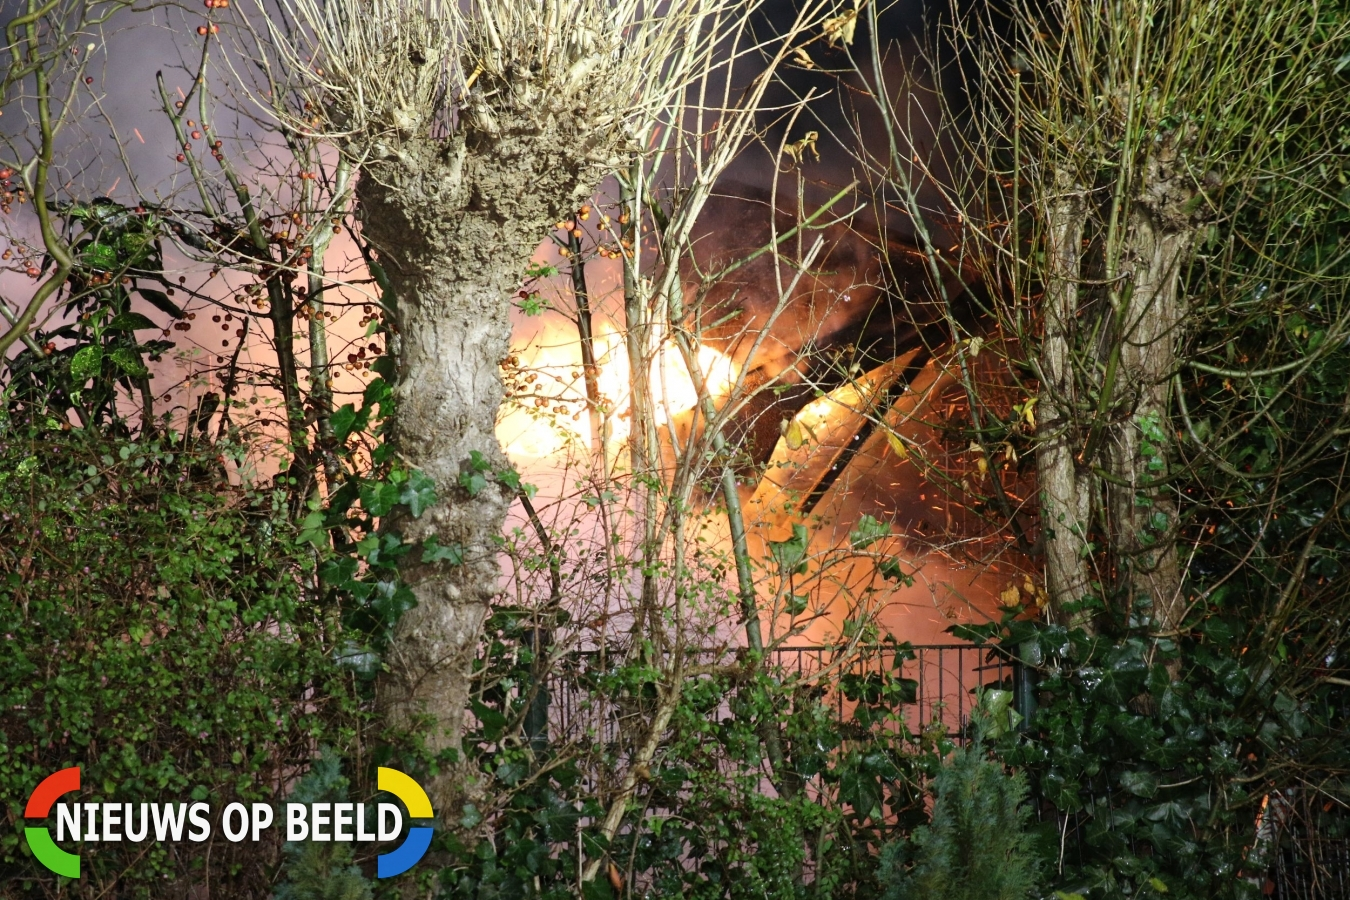 Tuinhuisje achter woning brand volledig uit Oosteinde Warmond